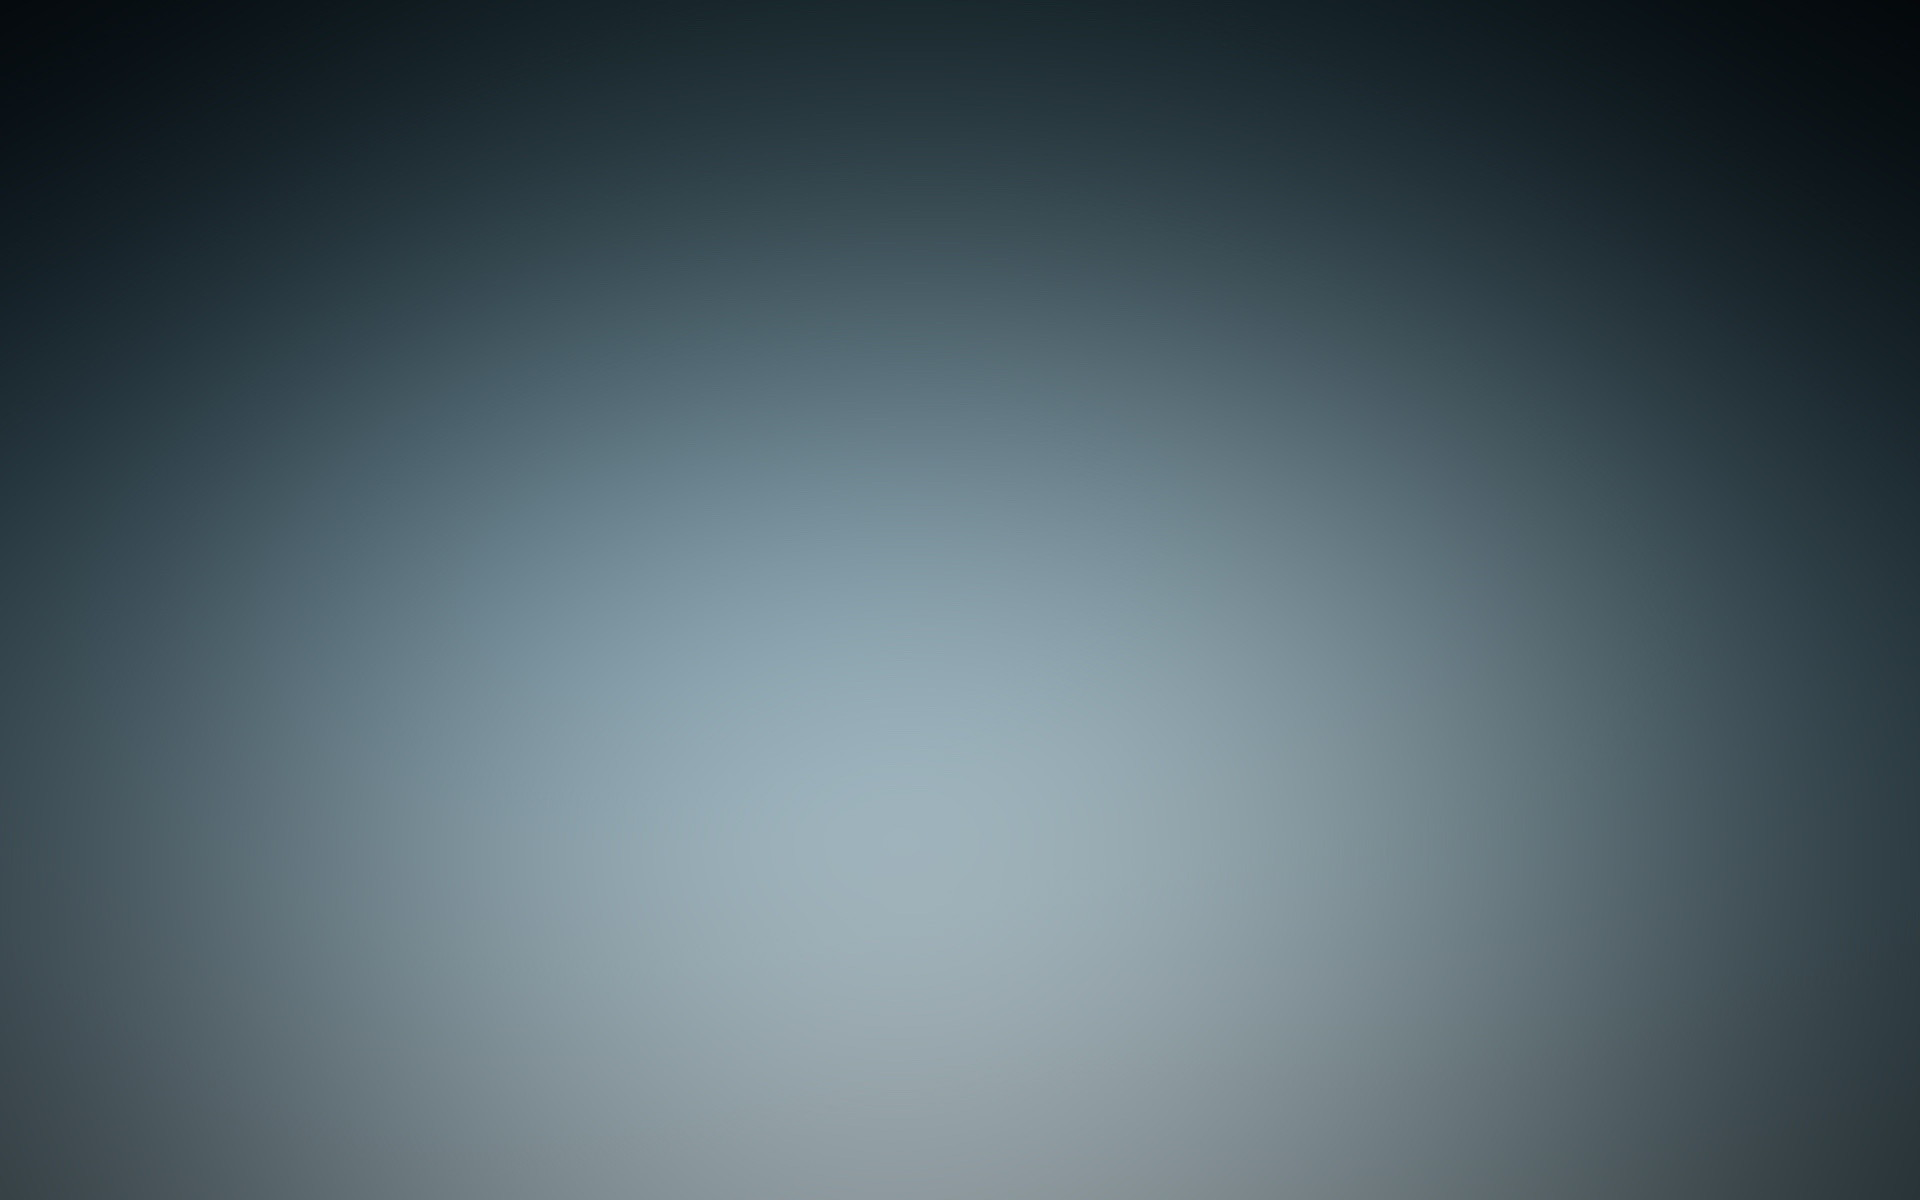 Res: 1920x1200, Popular Black Light WallpaperBuy Cheap Black Light,Popular Light Reflective  WallpaperBuy Cheap Light,Woman on Gray Concrete Bath Tub Free Stock  Photo,Black ...